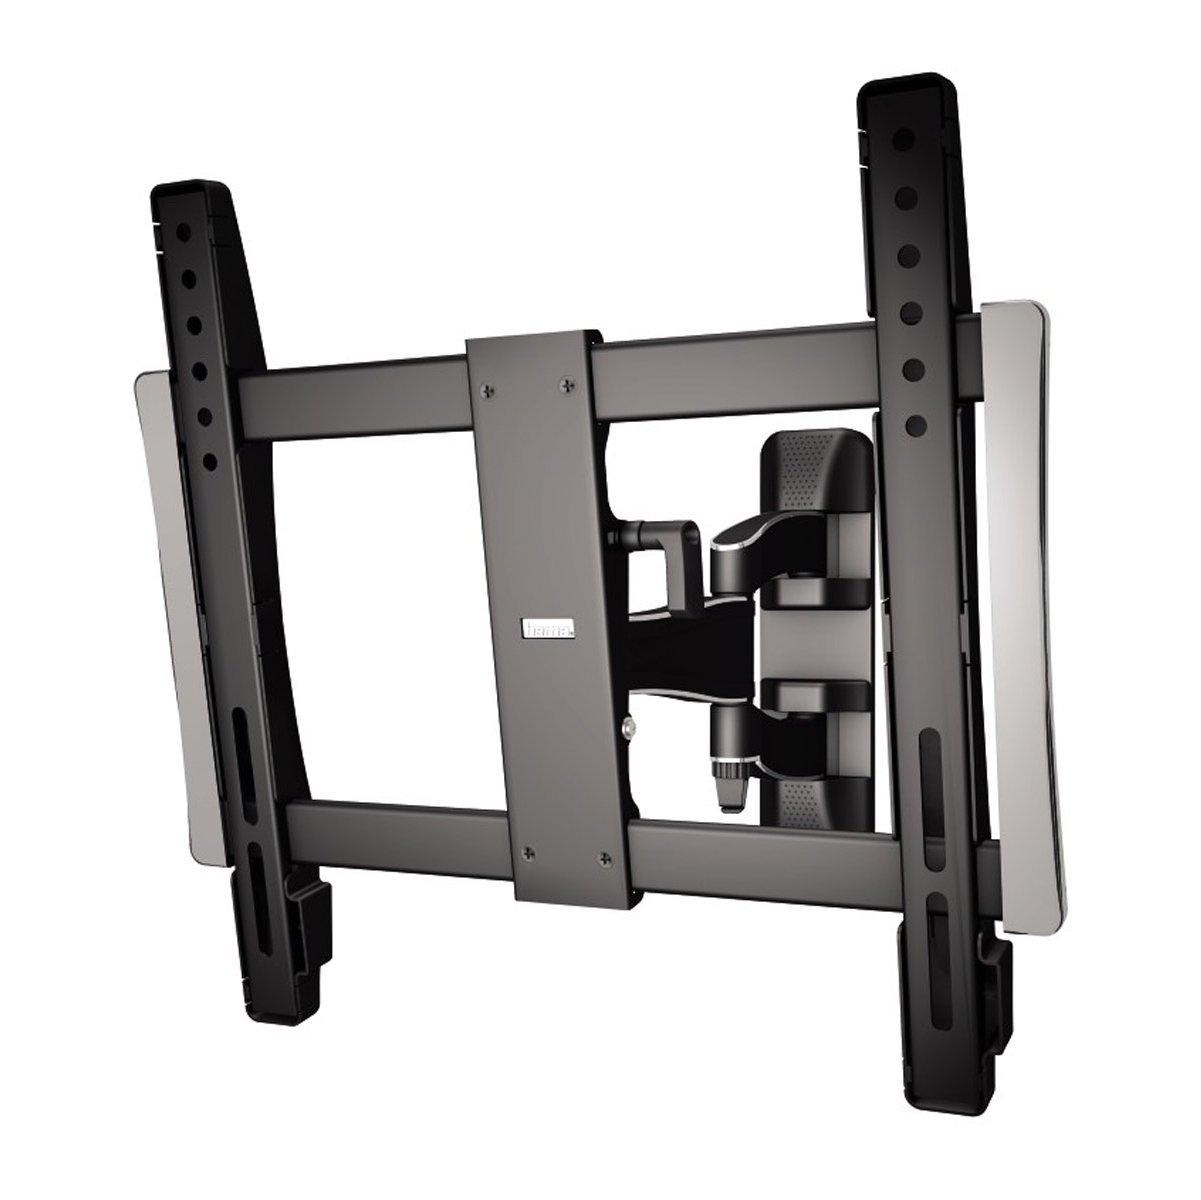 Hama Products 00118056 Tv Wall Brackets